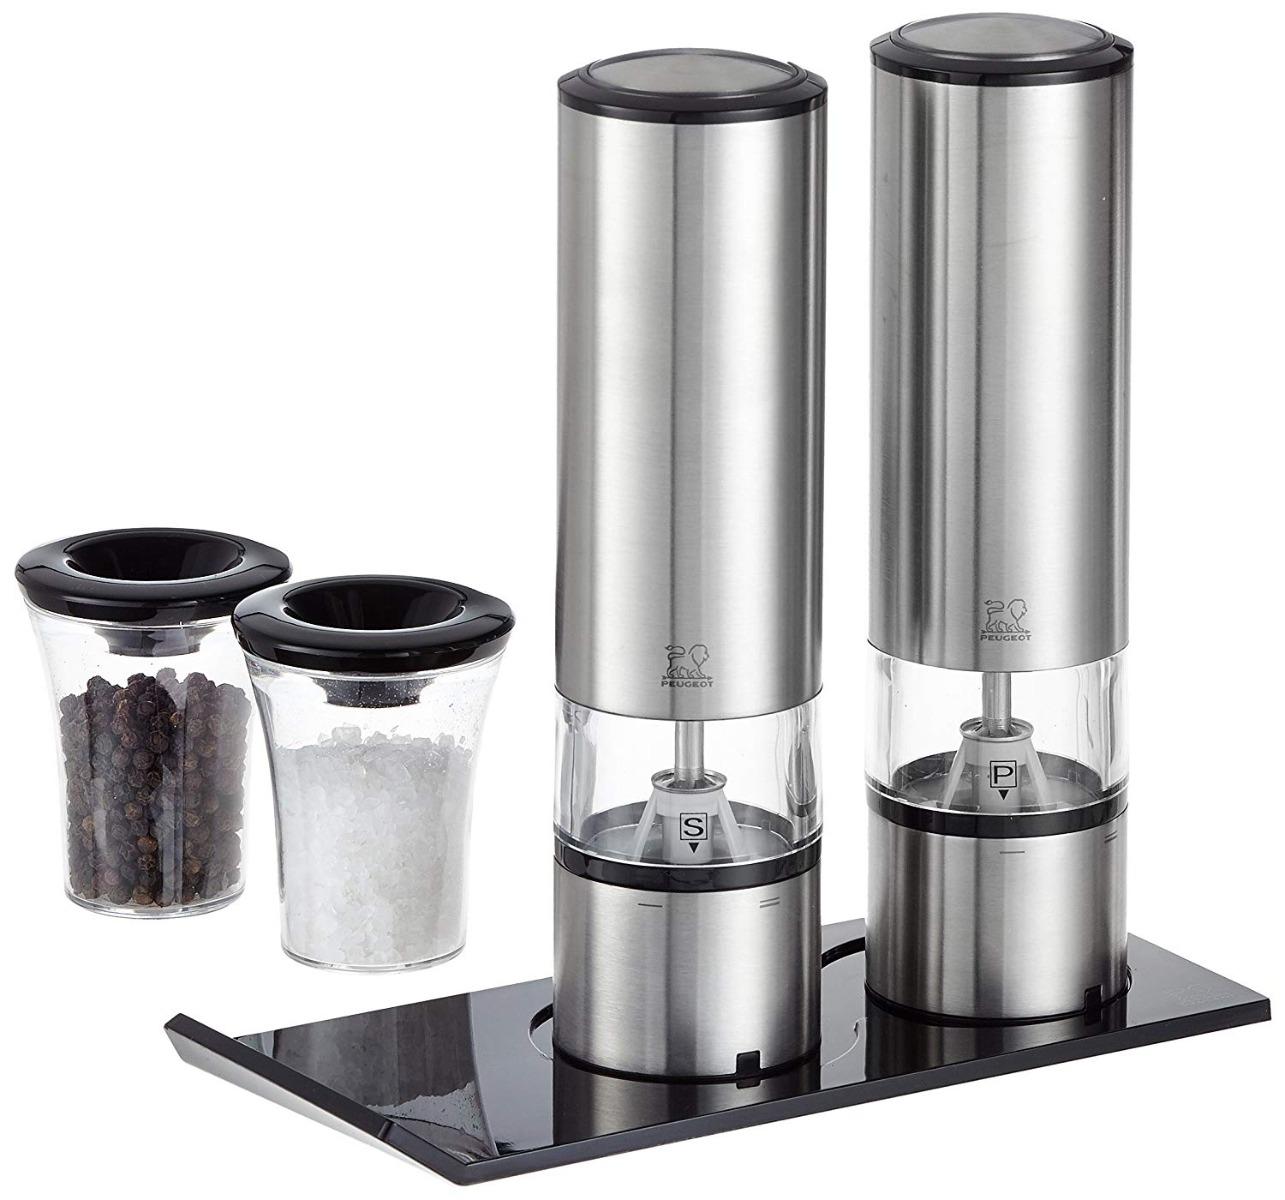 Elis Sense DUO Salt & Pepper Set with tray